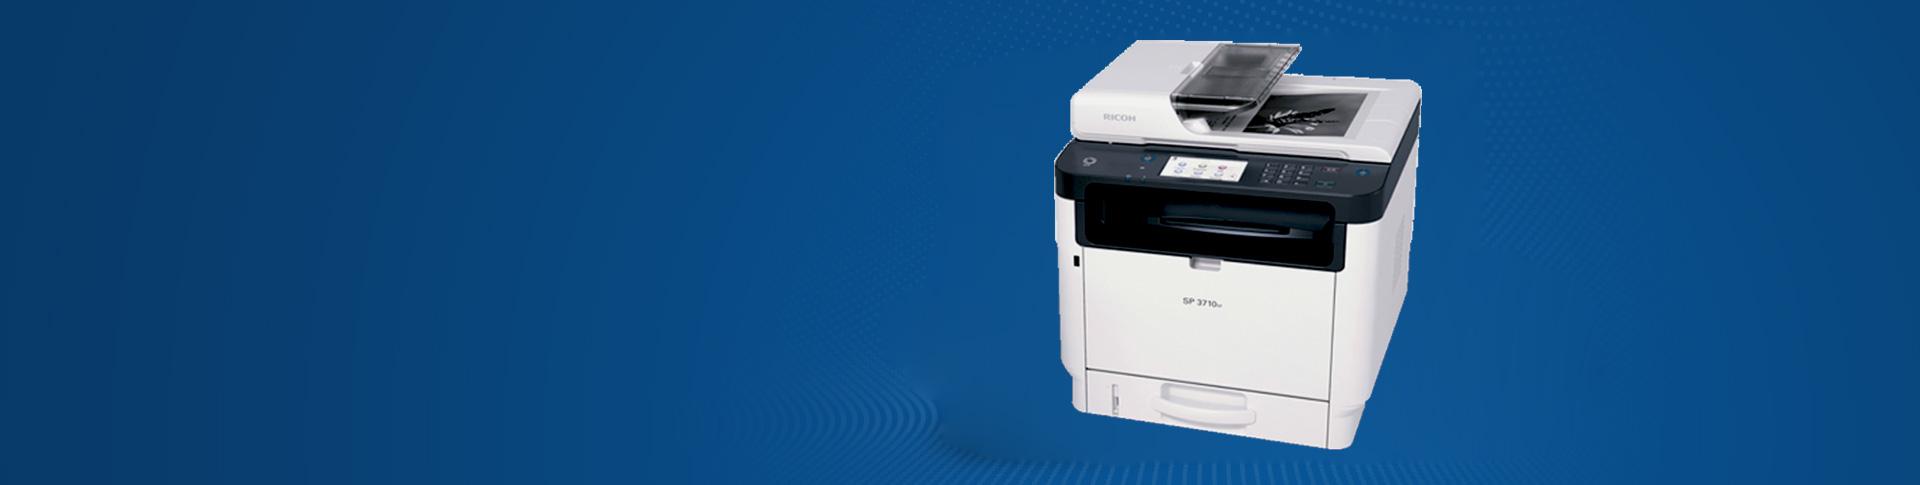 Impressoras-Konica-Minolta-1